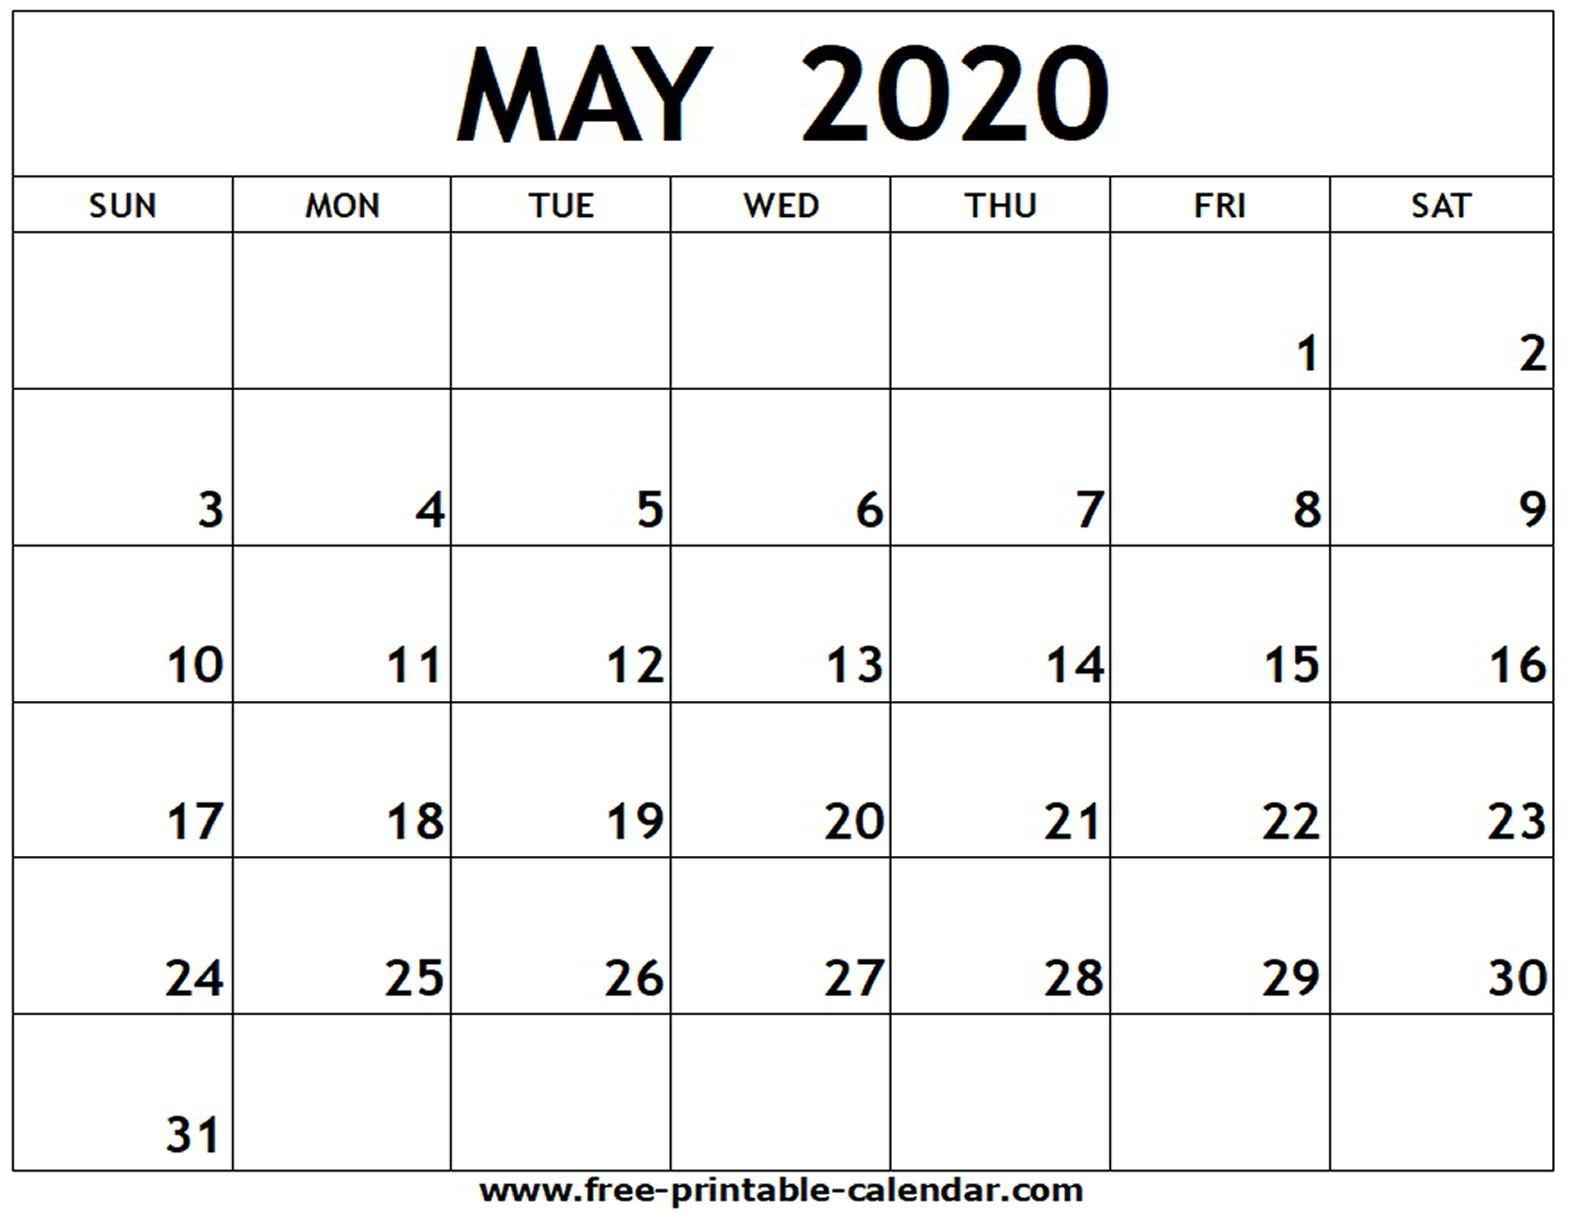 May 2020 Printable Calendar - Free-Printable-Calendar